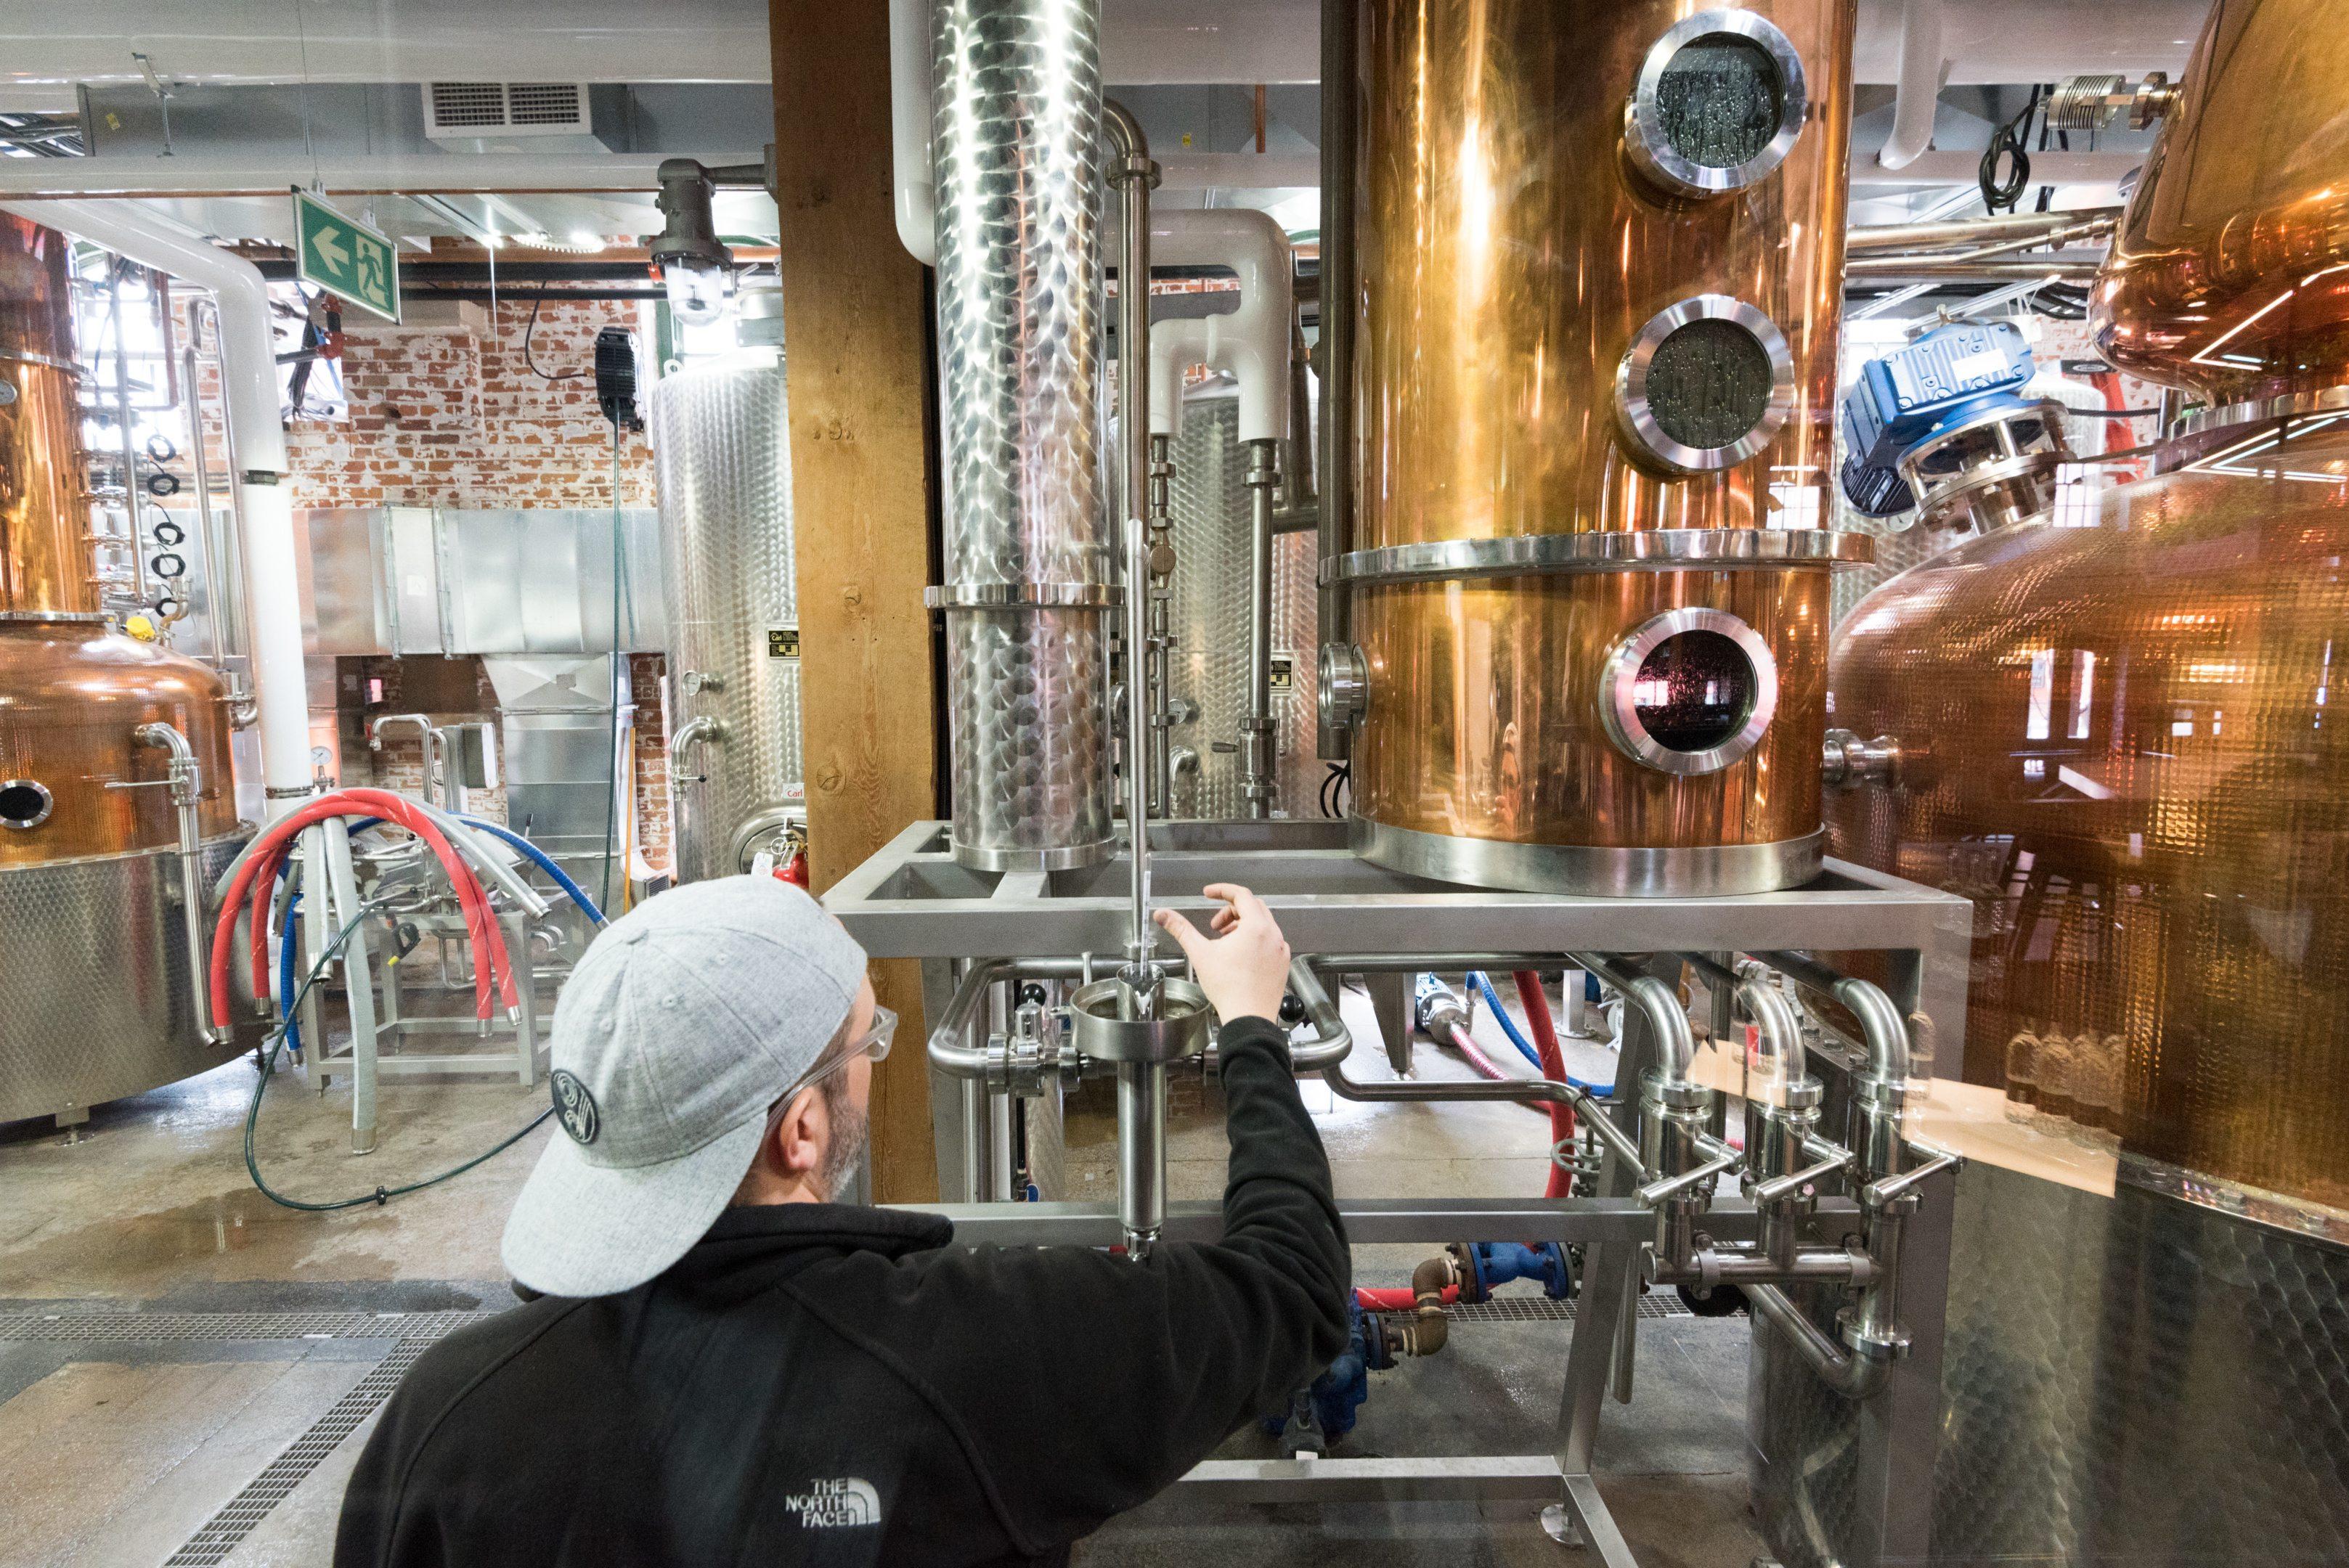 toronto-bars-spirit-of-york-distillery-co-distillery-district-equipment-3